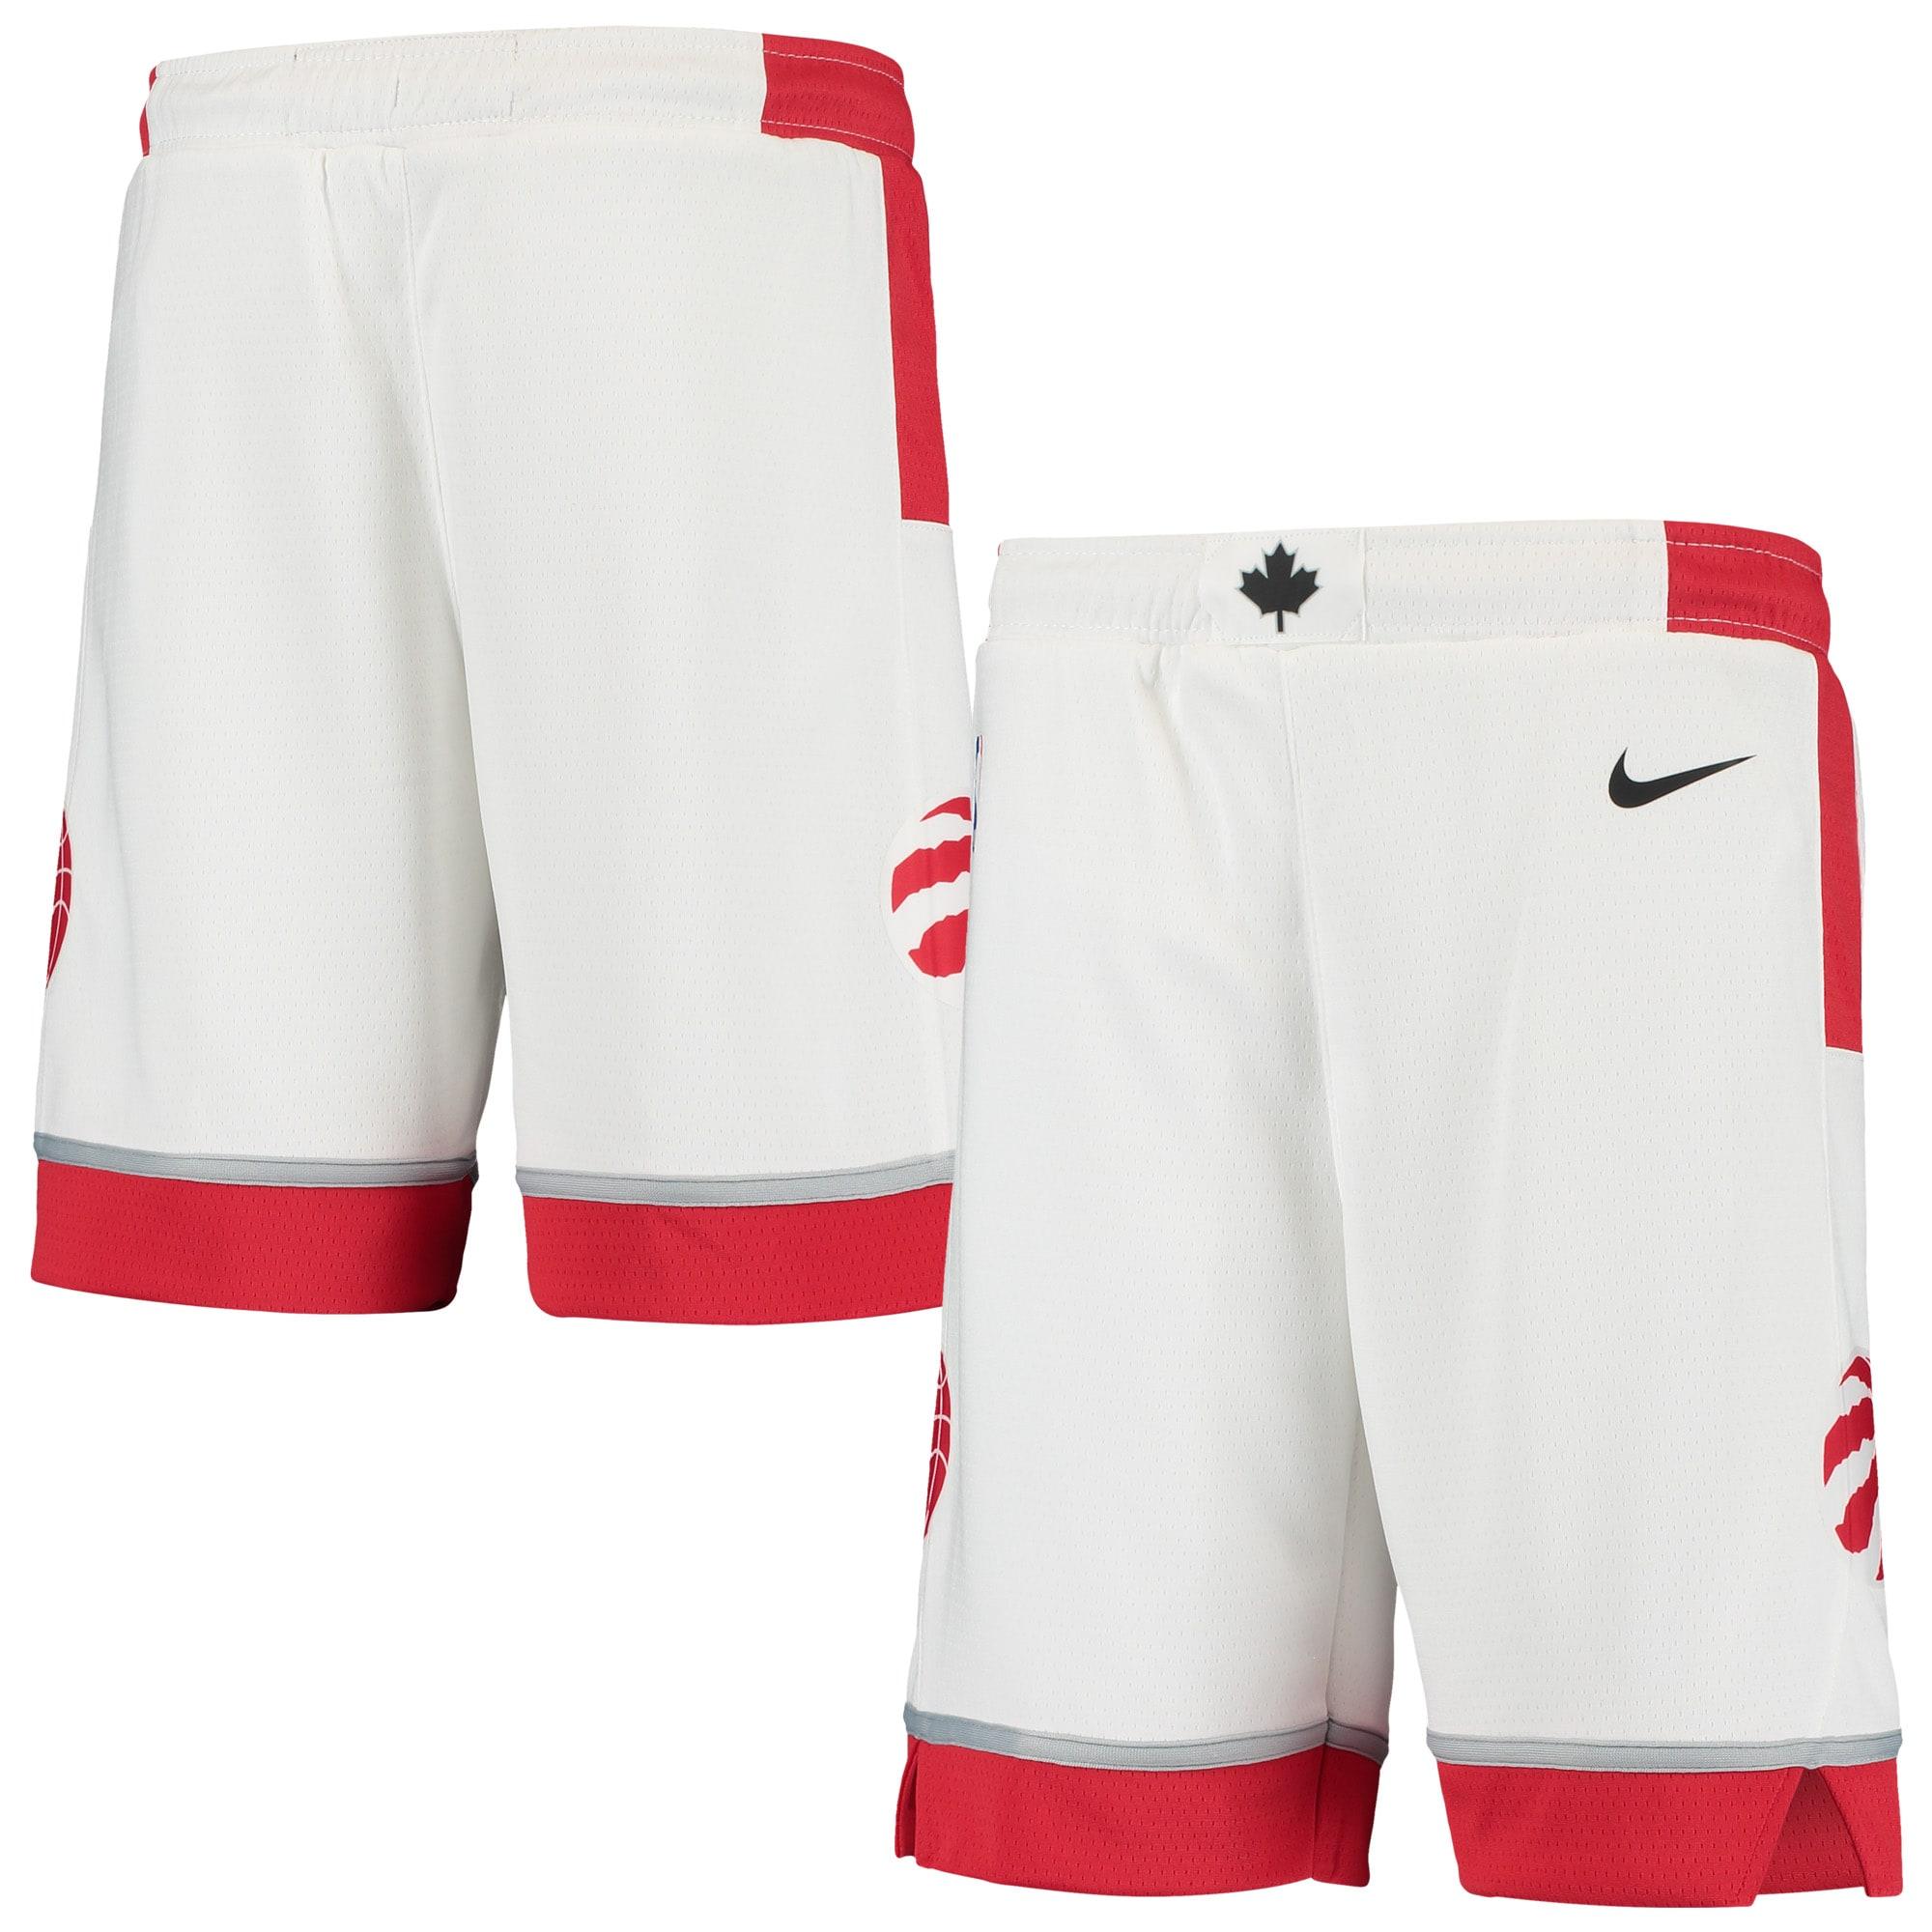 Toronto Raptors Nike Youth Swingman Association Short - White